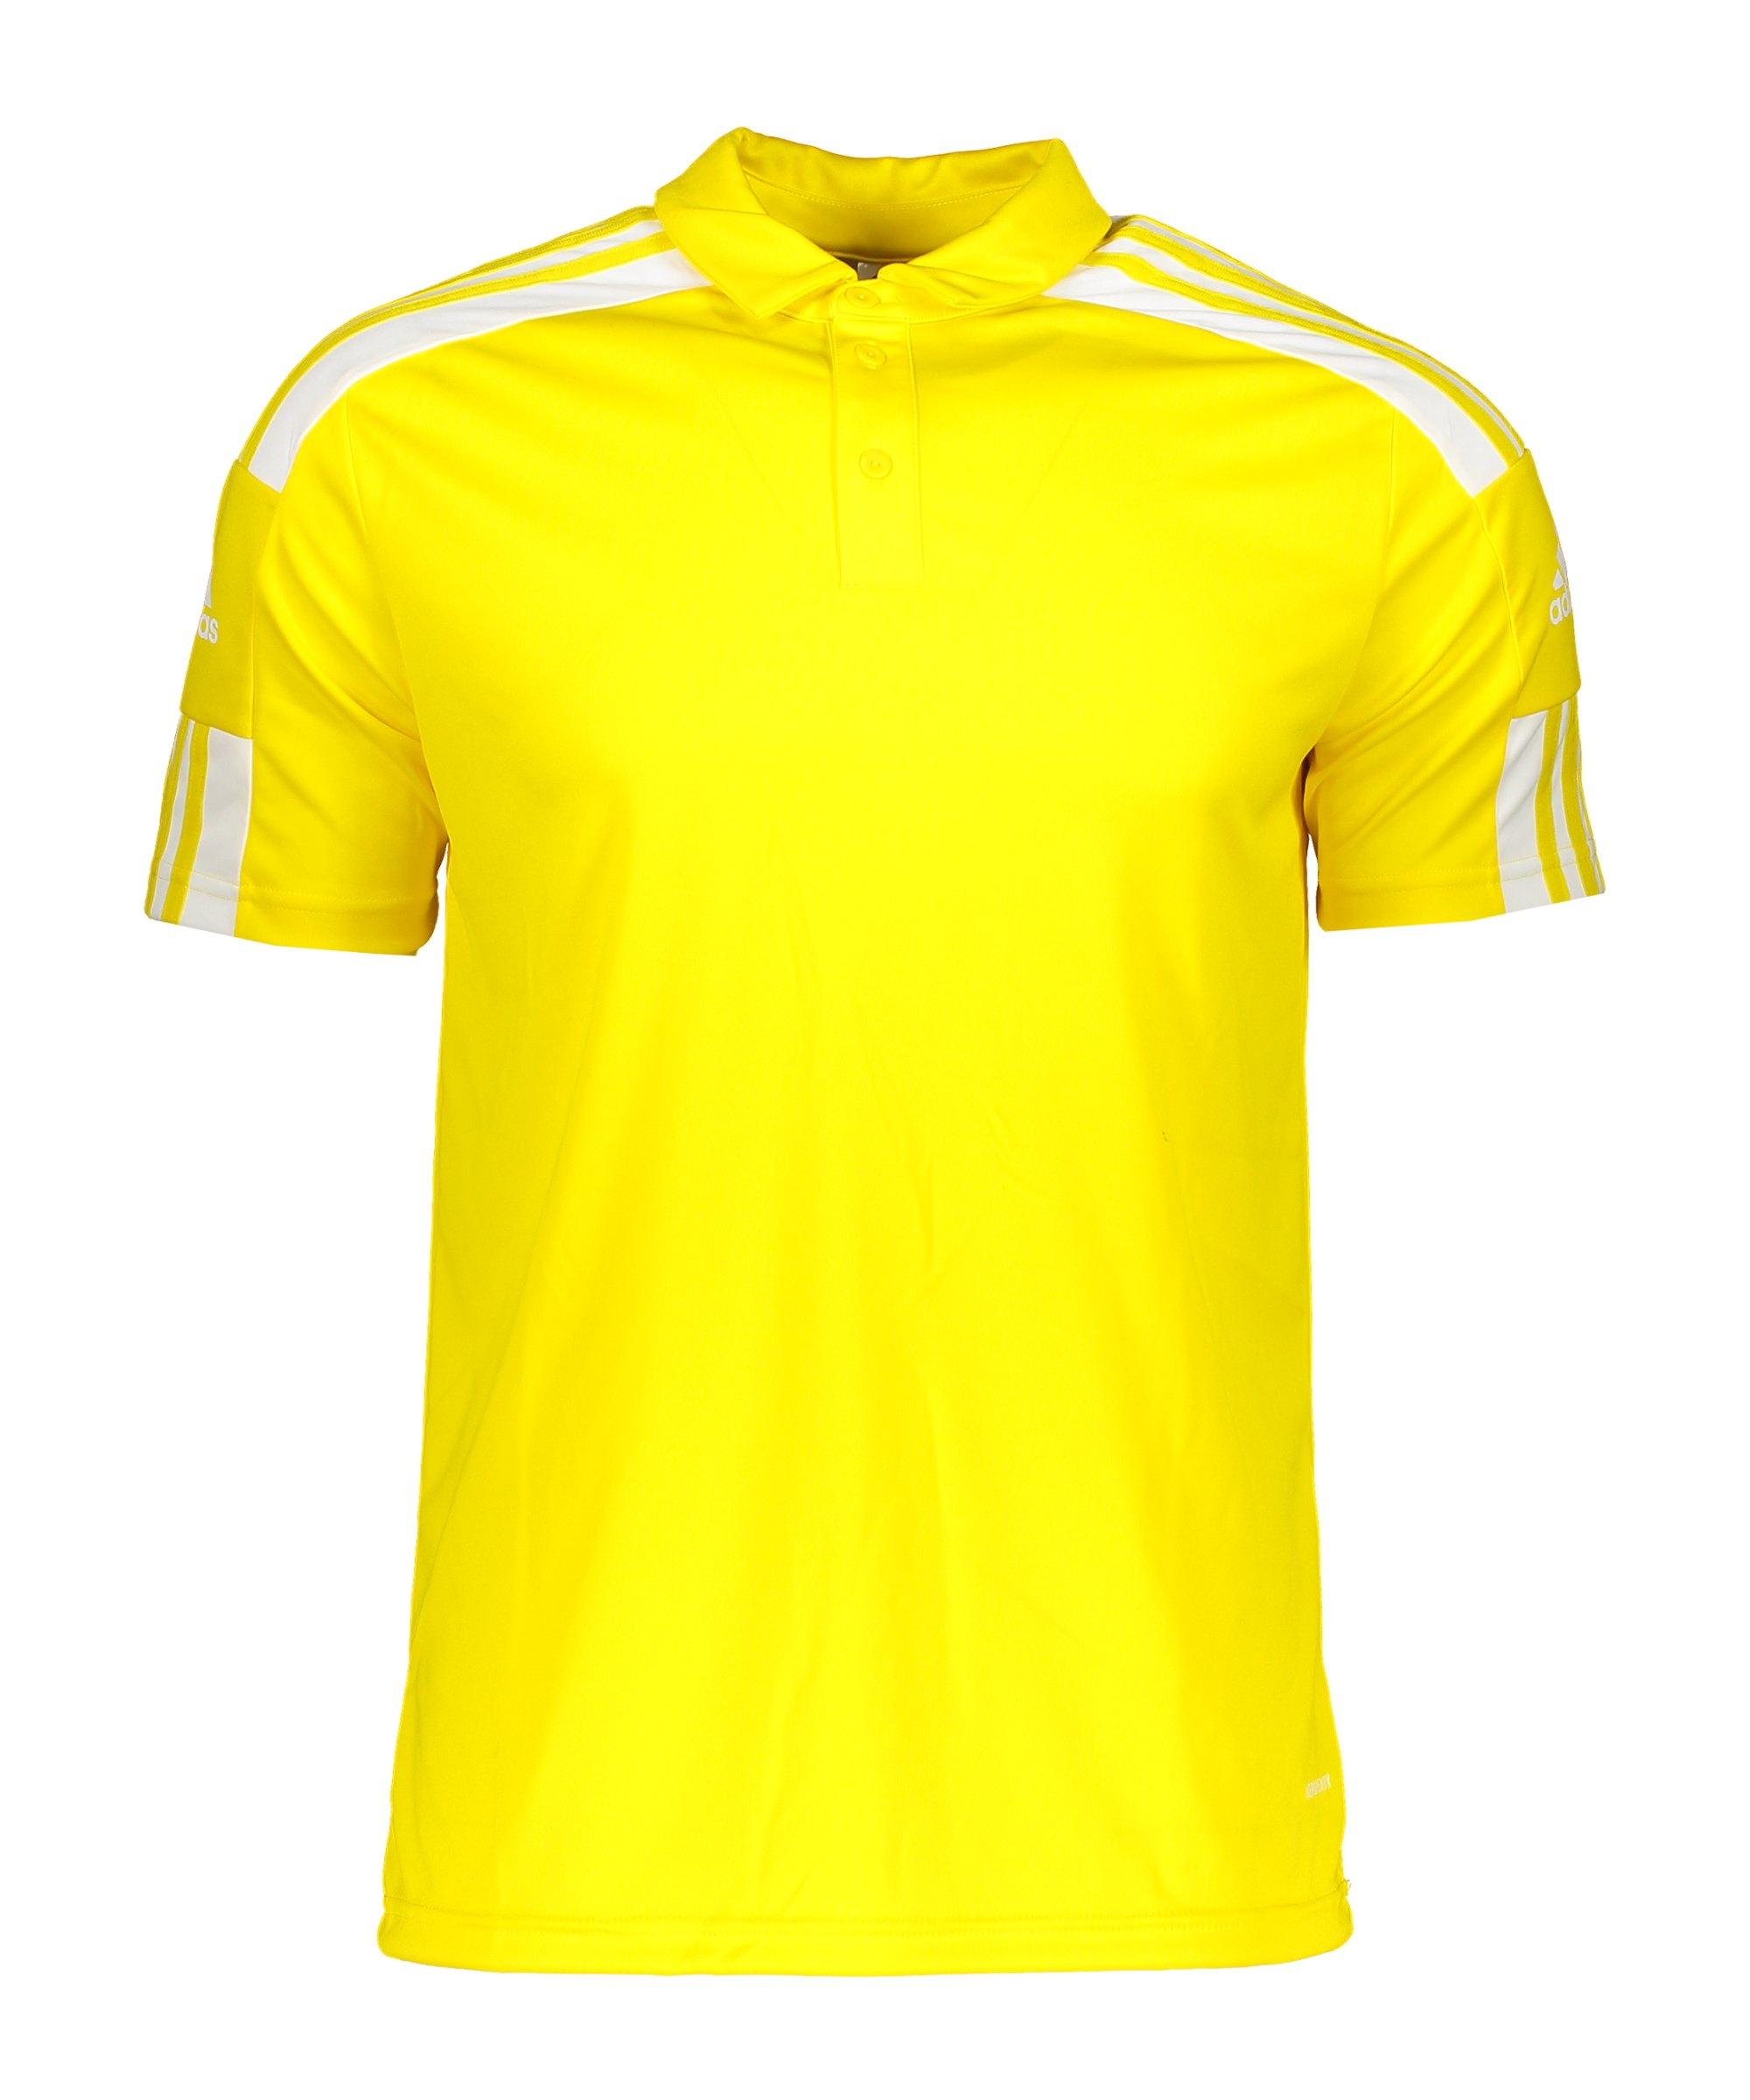 adidas Squadra 21 Poloshirt Gelb Weiss - gelb